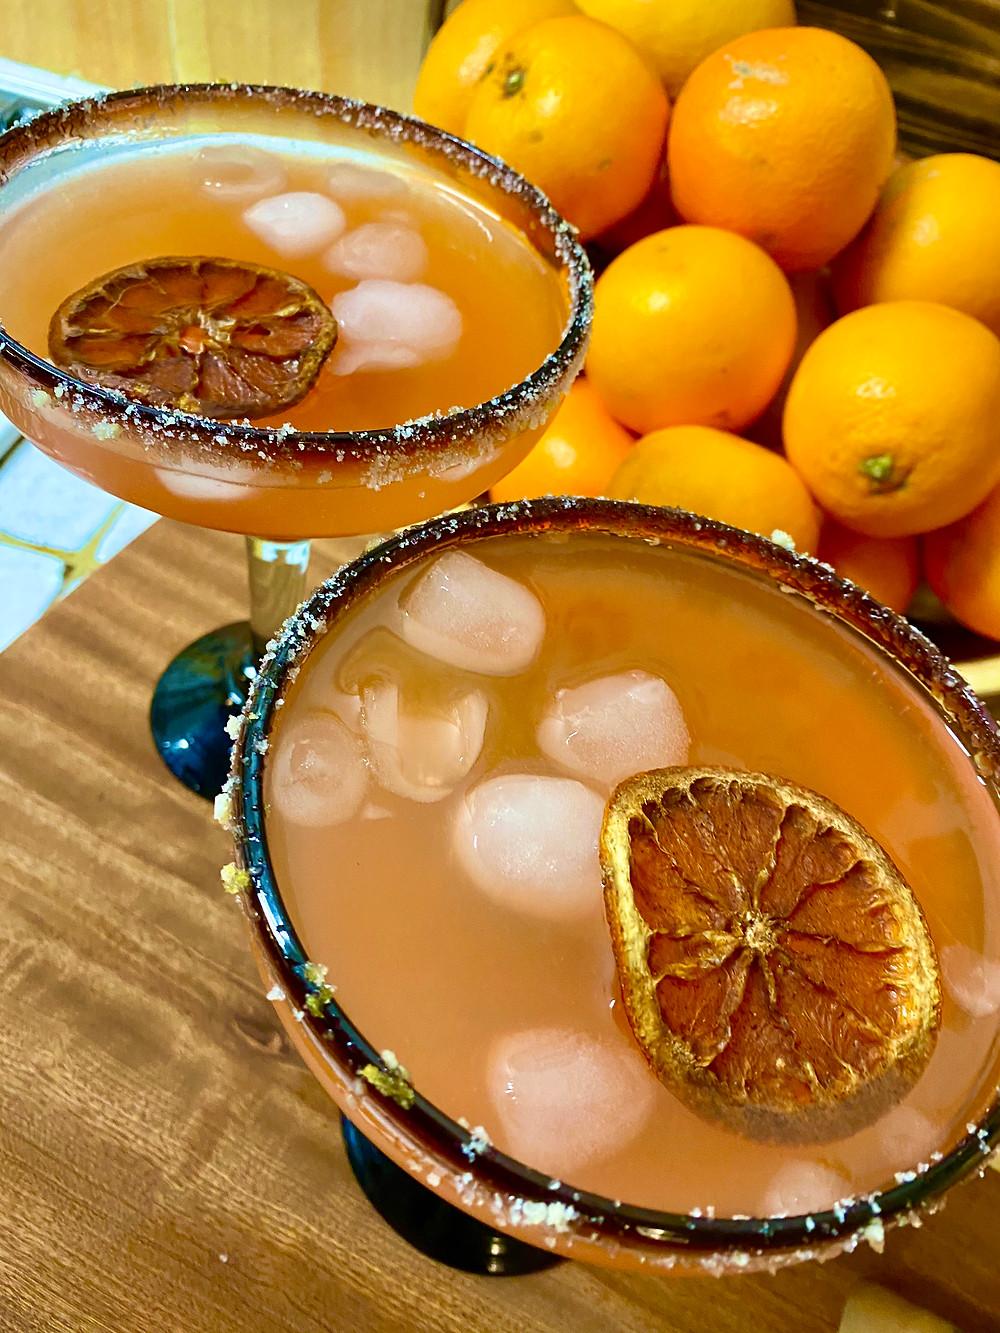 sicily-blood-orange-margarita